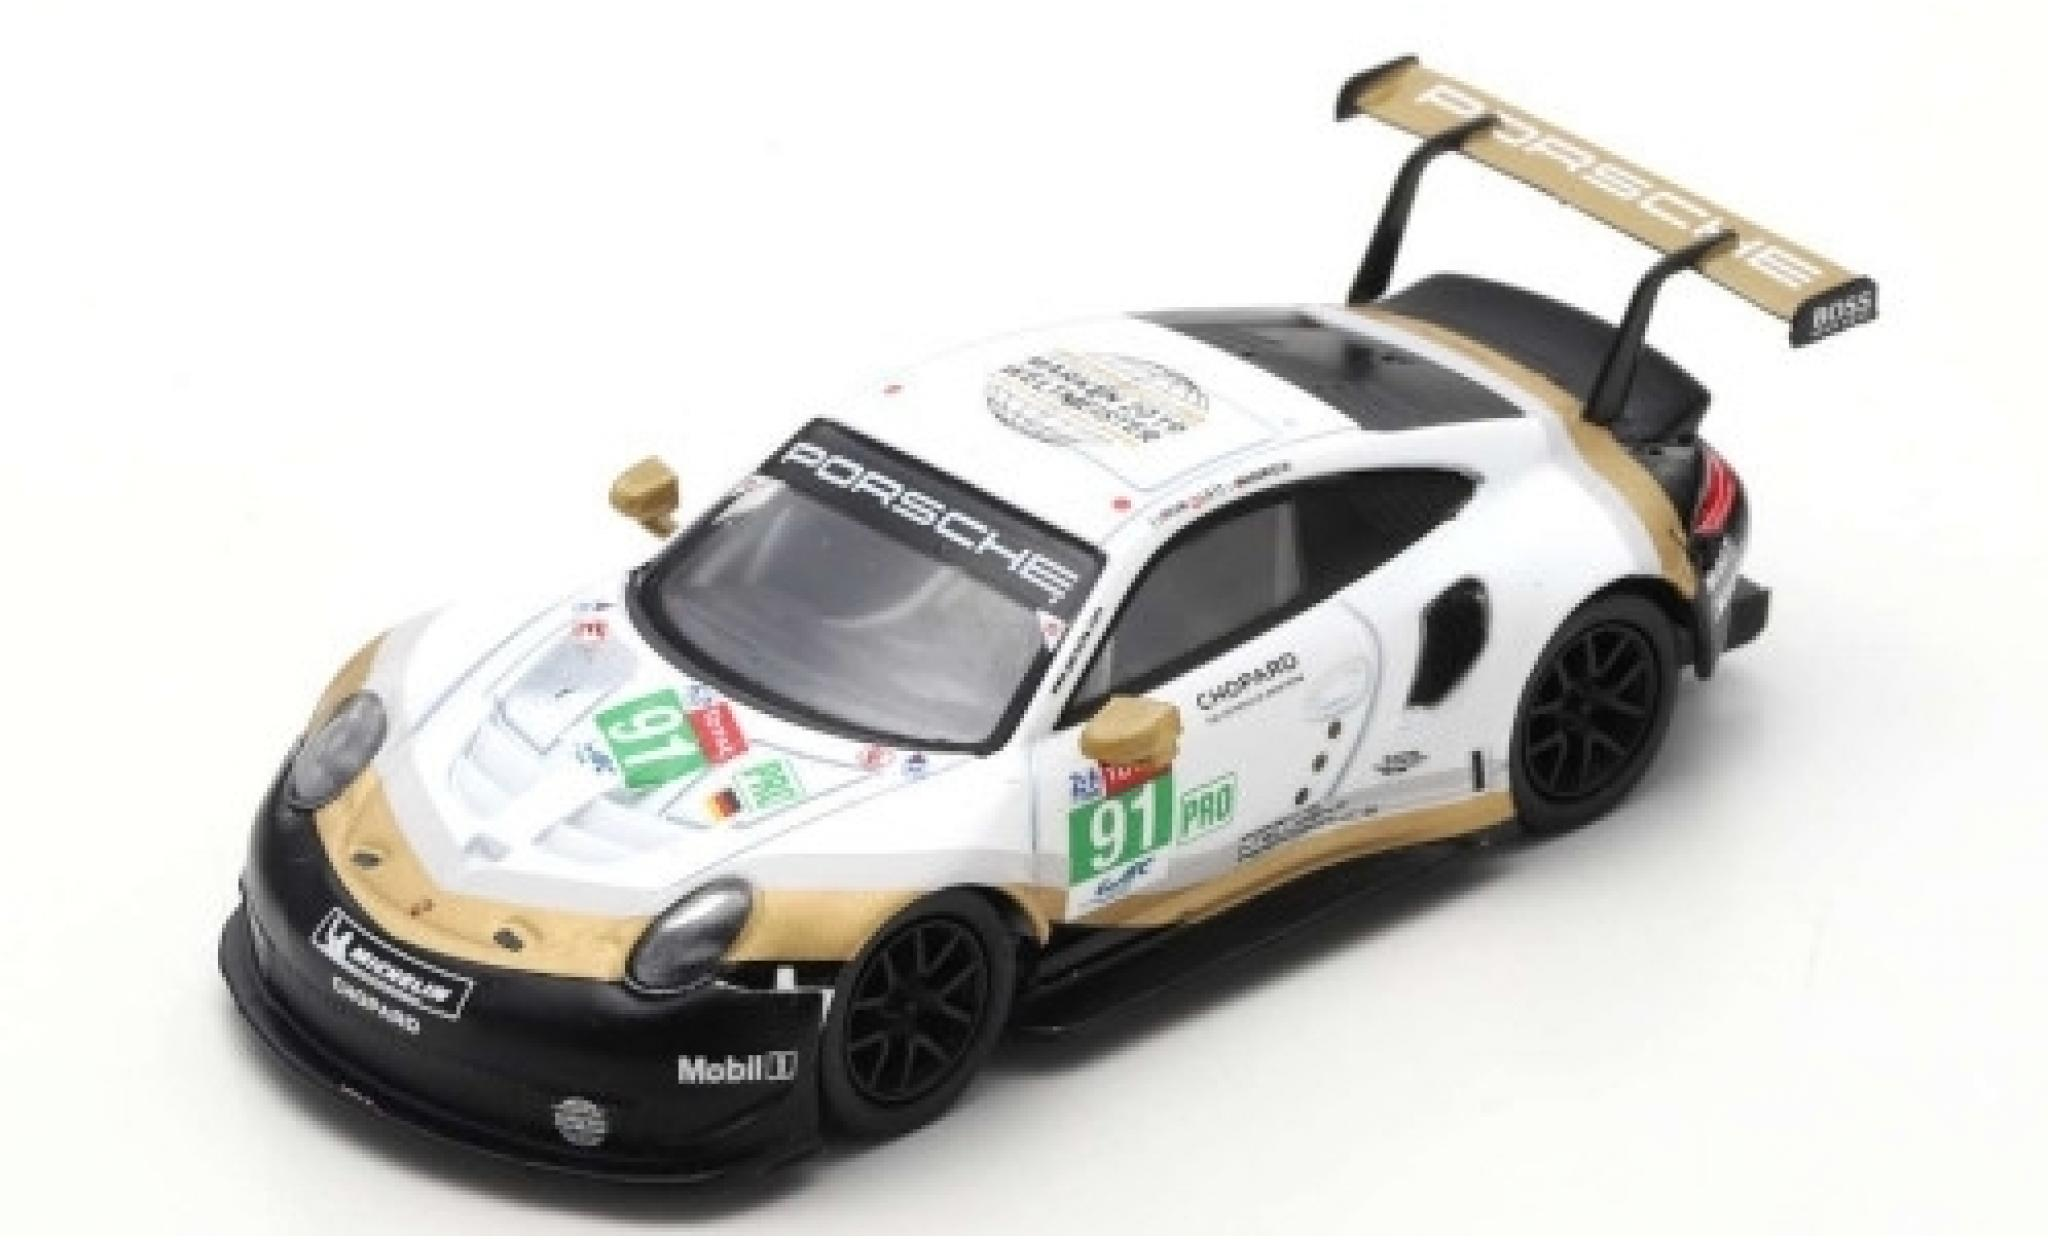 Porsche 911 1/43 Spark (991) RSR No.91 GT Team 24h Le Mans 2019 R.Lietz/G.Bruni/F.Makowiecki